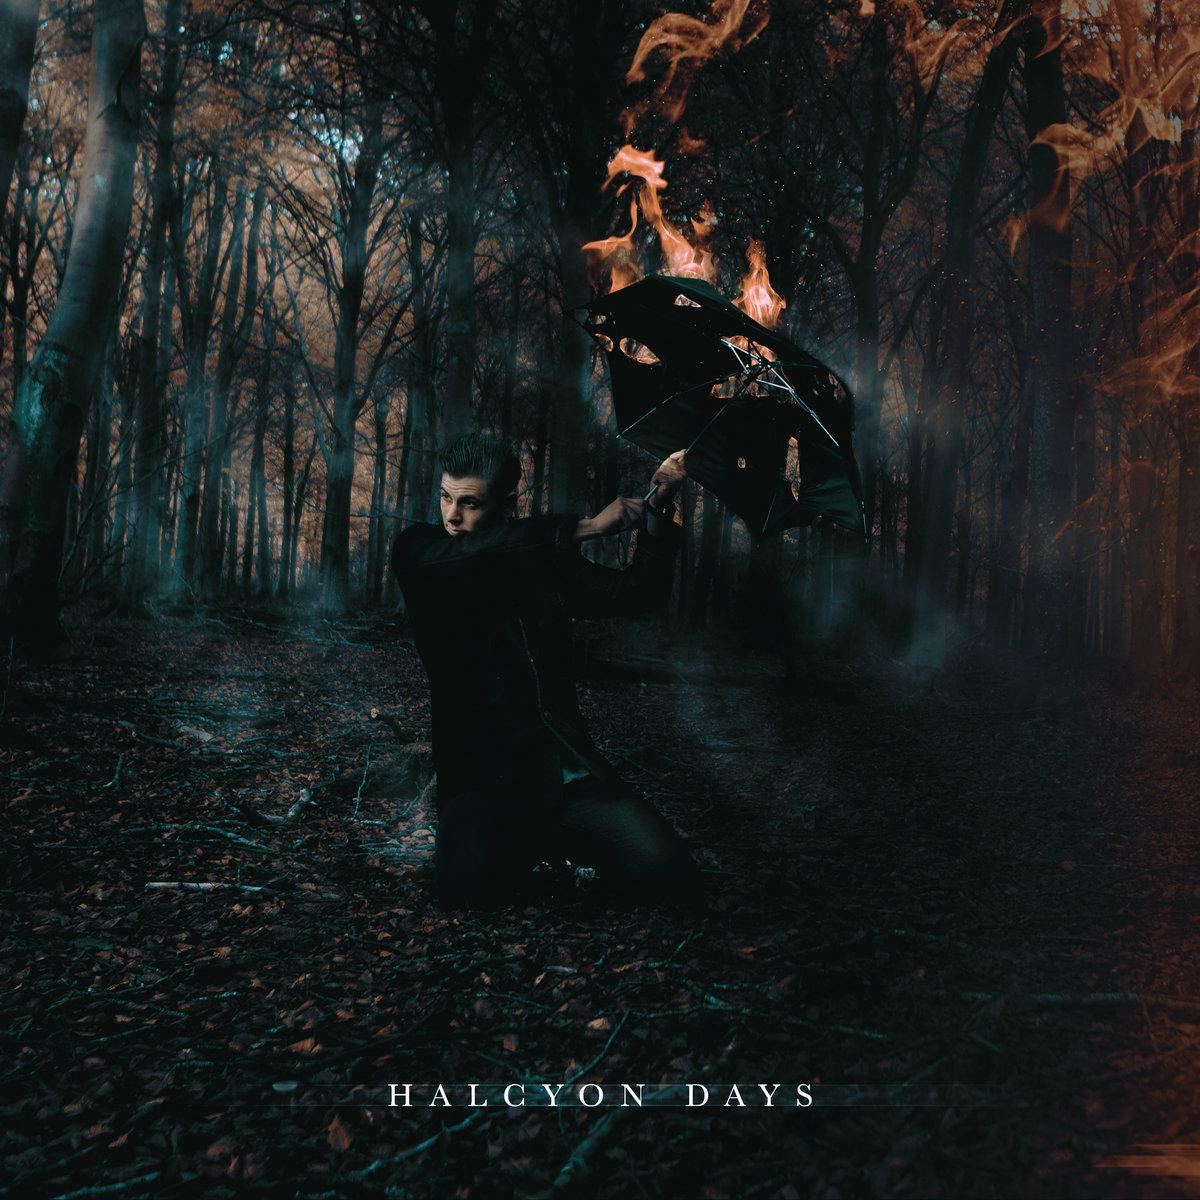 Halcyon Days - Halcyon Days [EP] (2016)